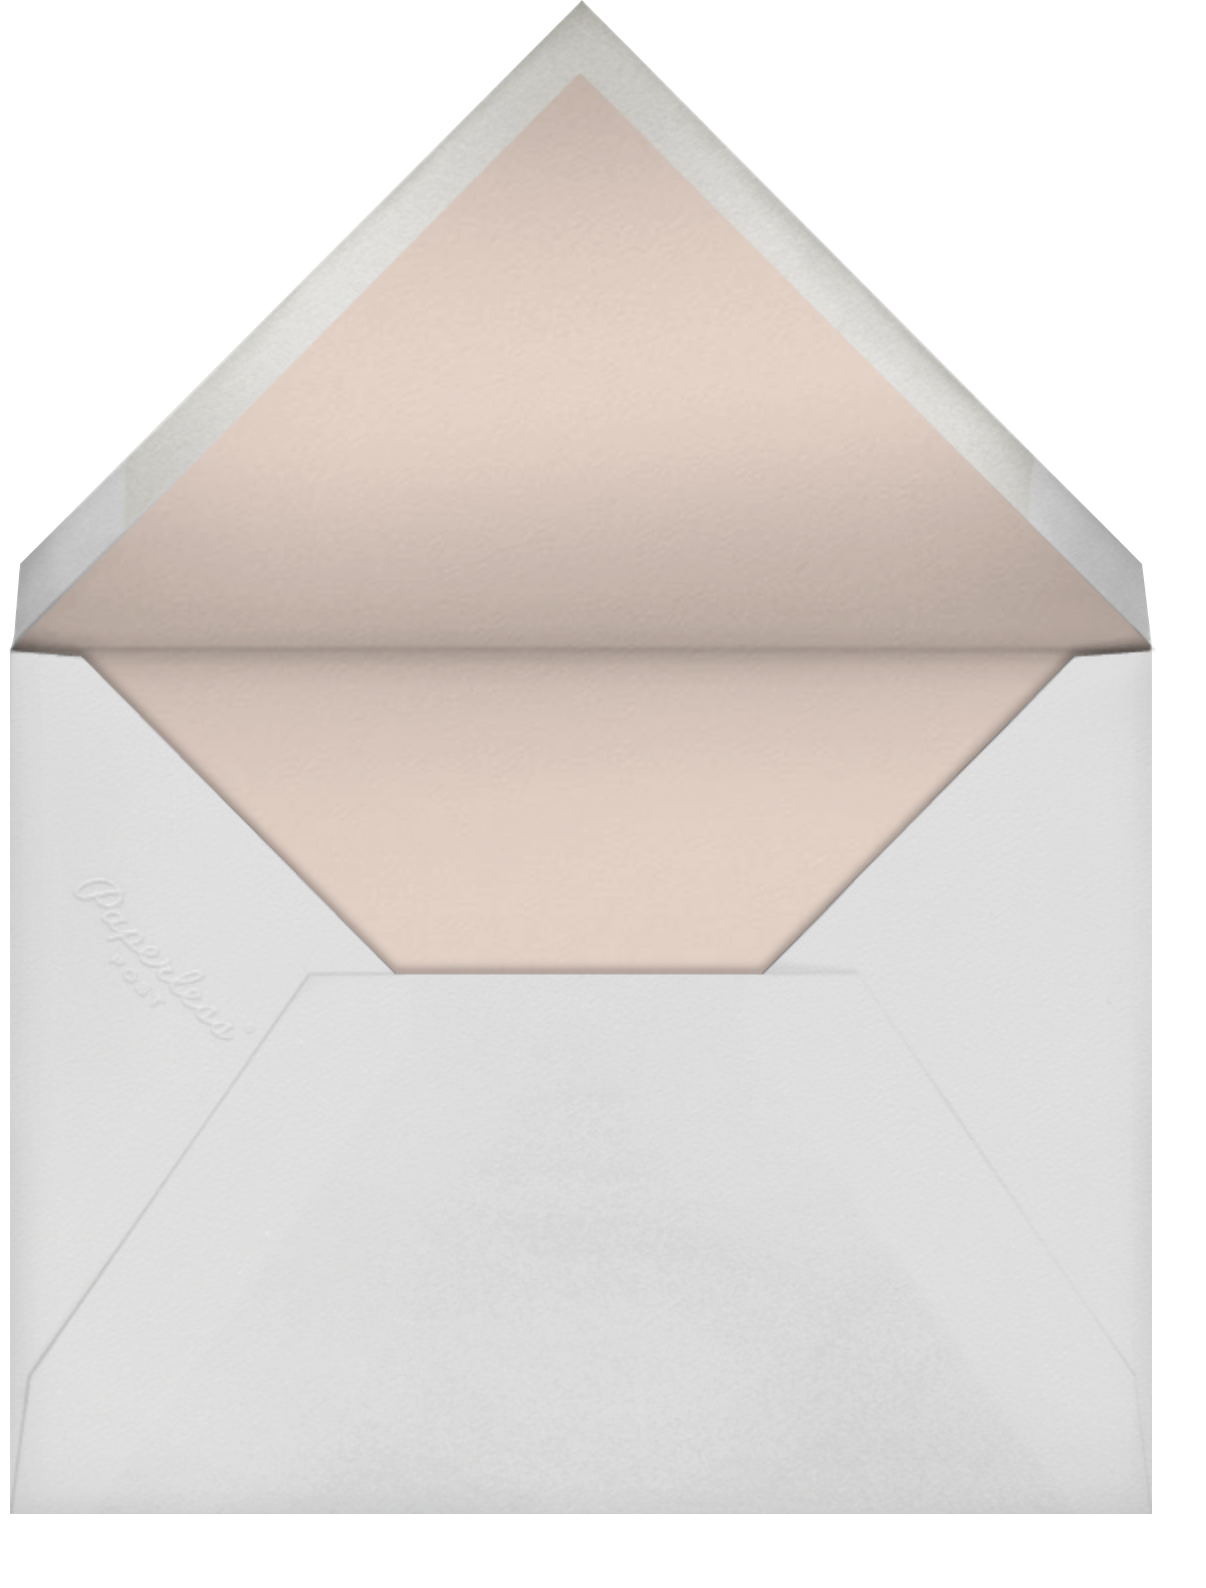 Alyona - Chamois - Paperless Post - Photo  - envelope back